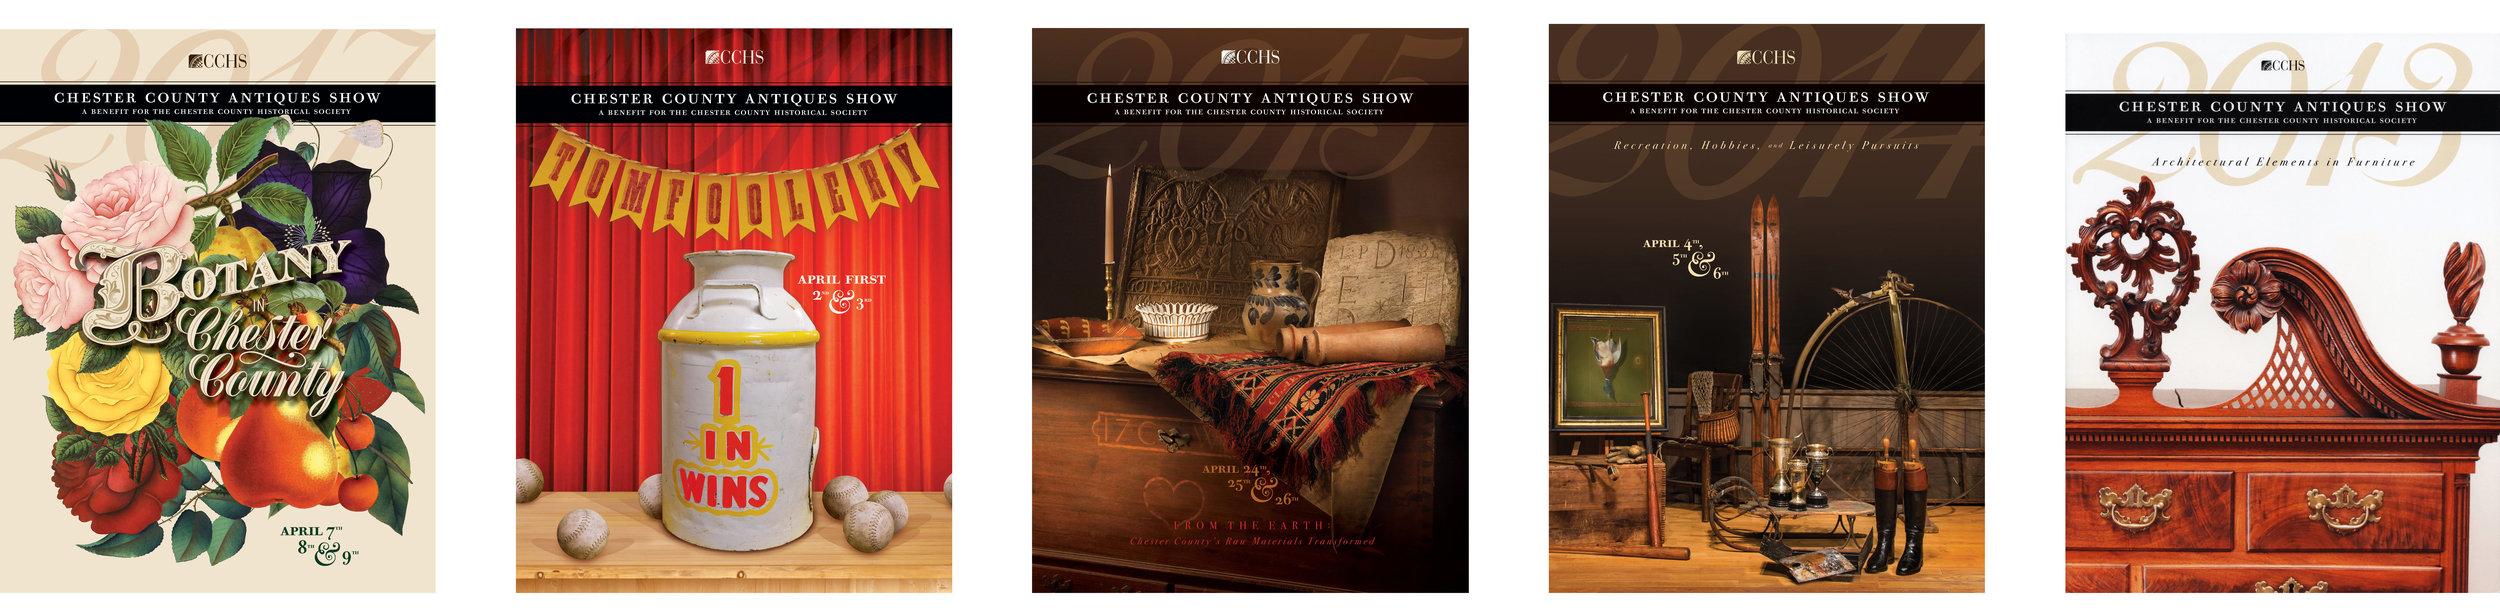 CCHS-covers.jpg